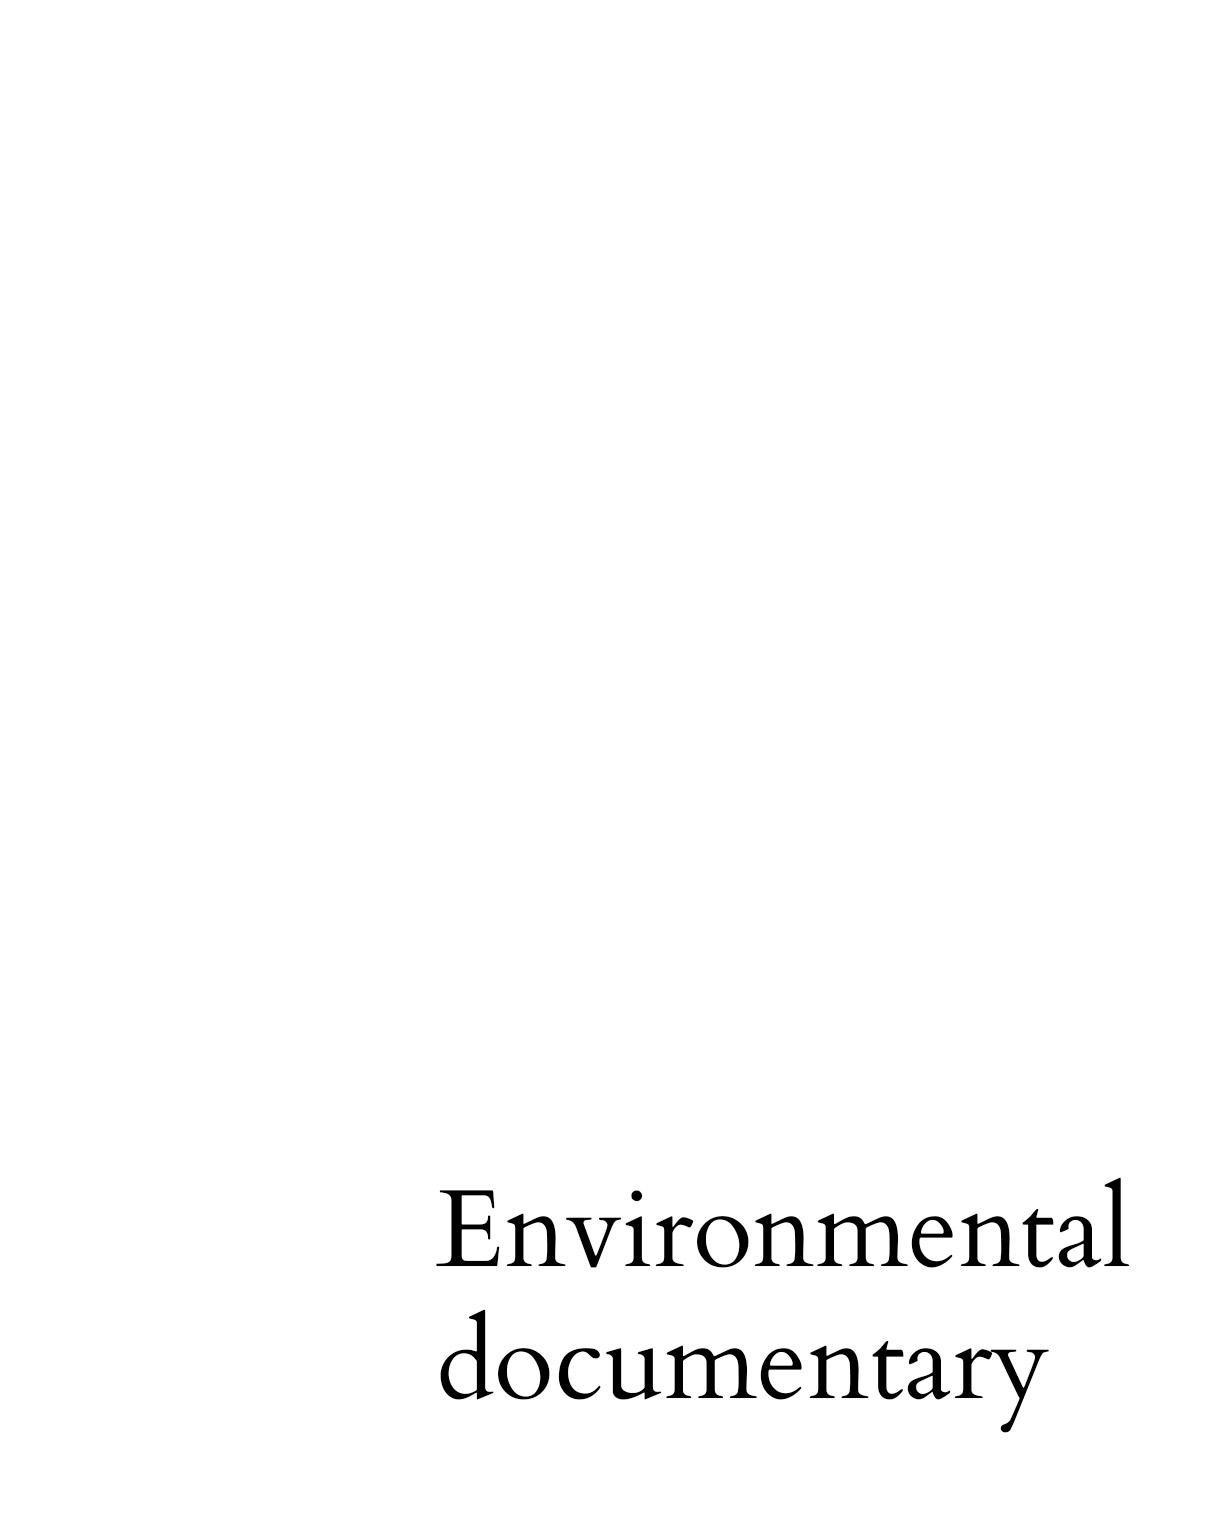 EnvironmentalDocTitle.jpg